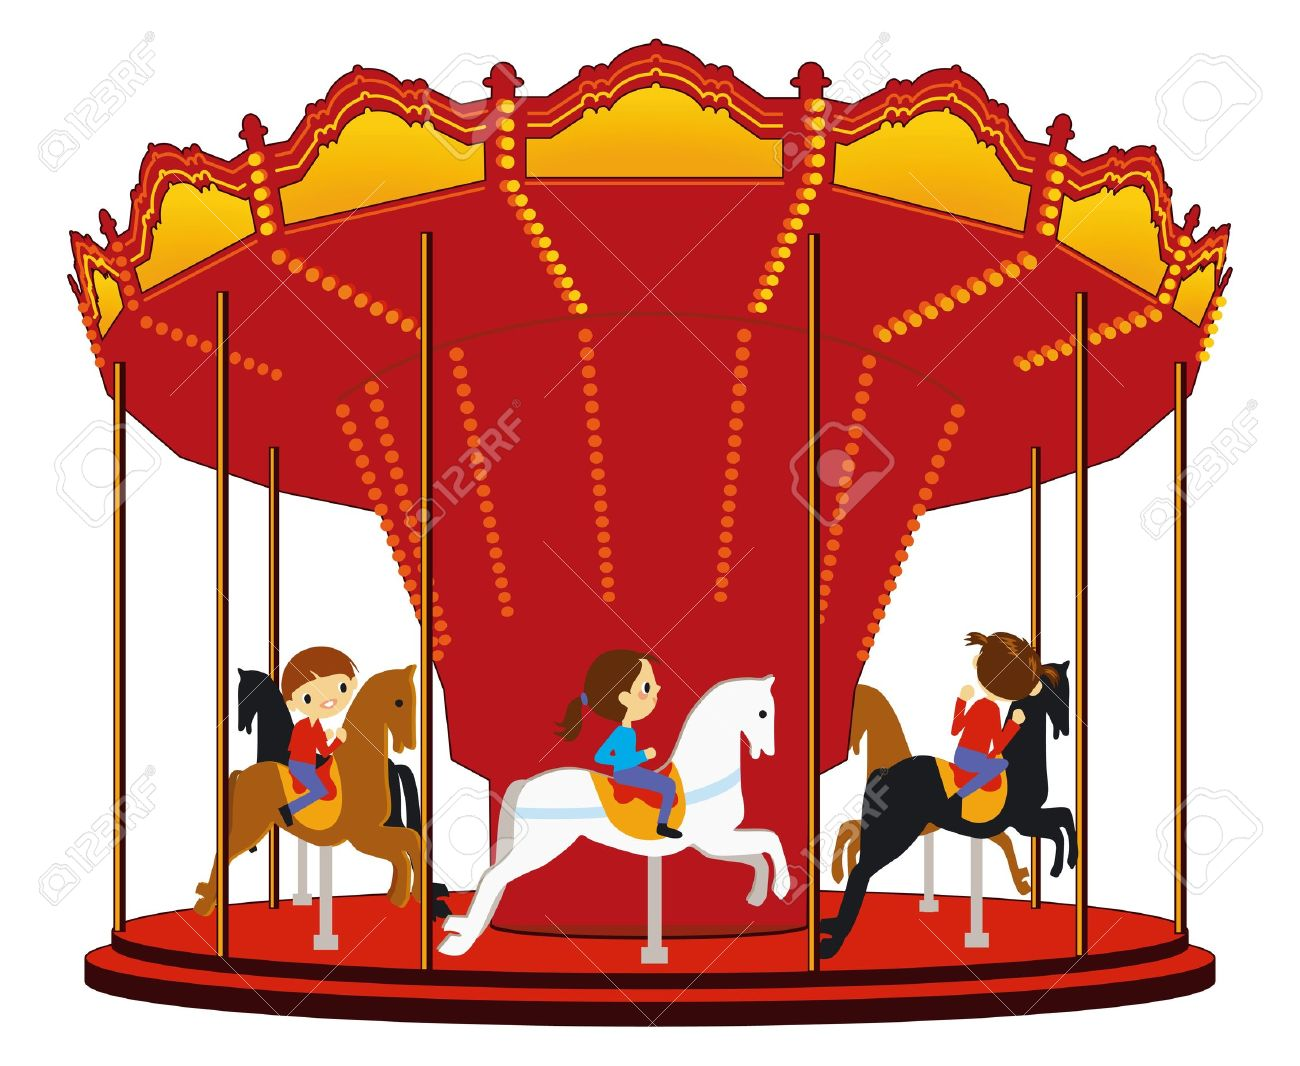 Carousel Clipart.